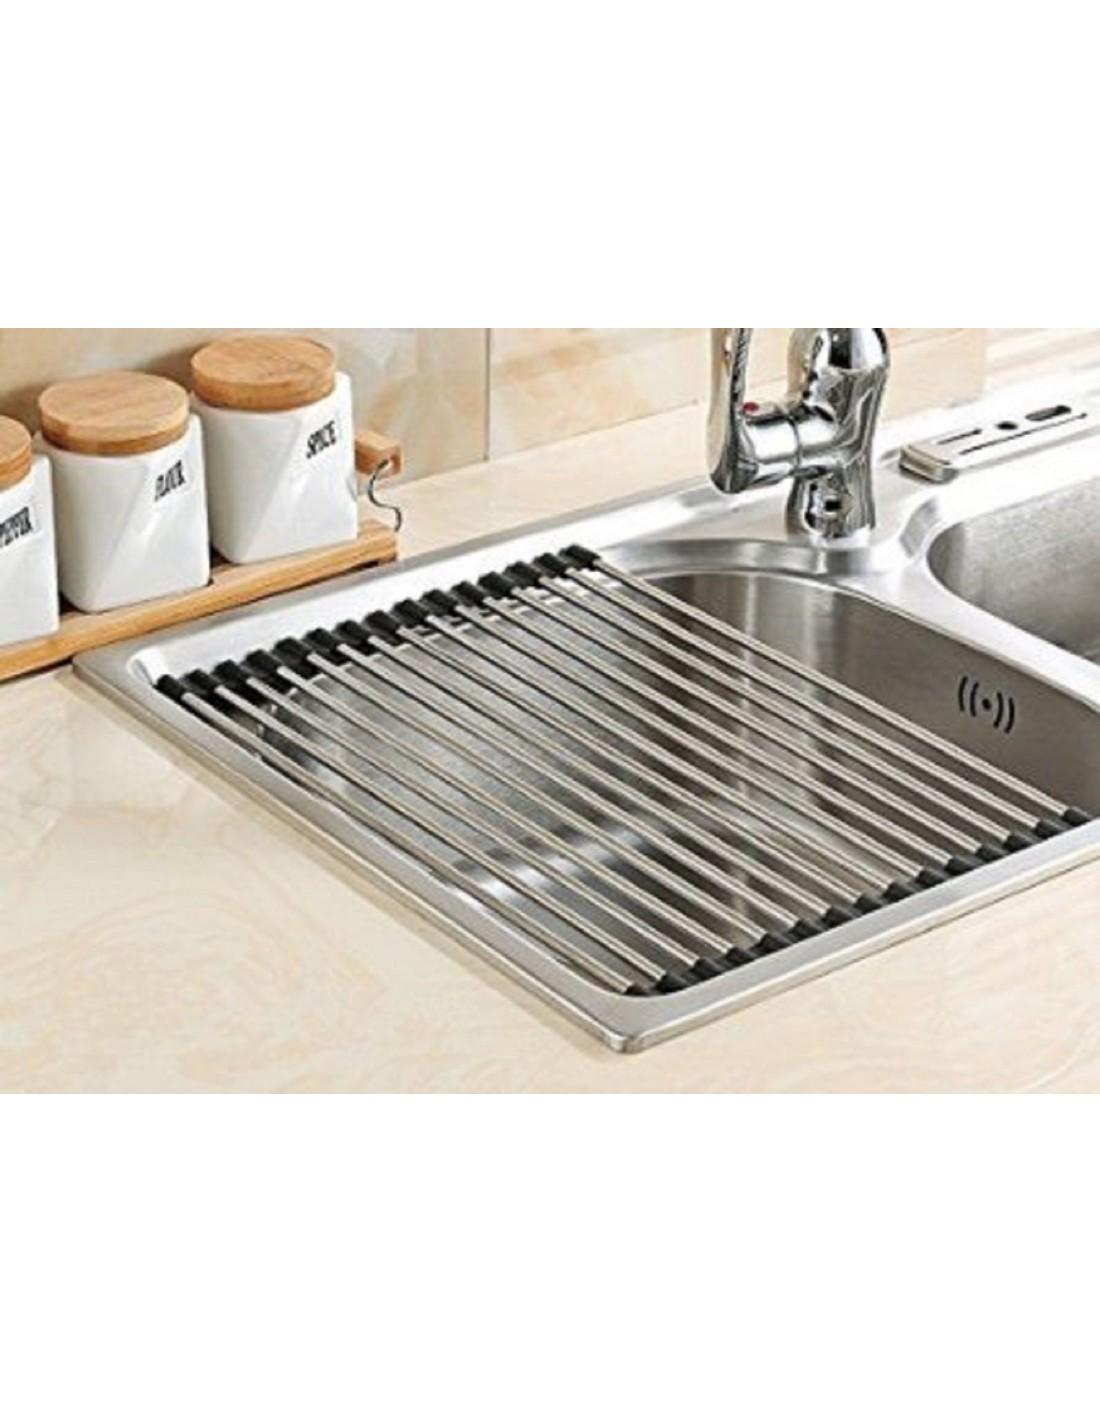 Sink Accessories East Coast Kitchens